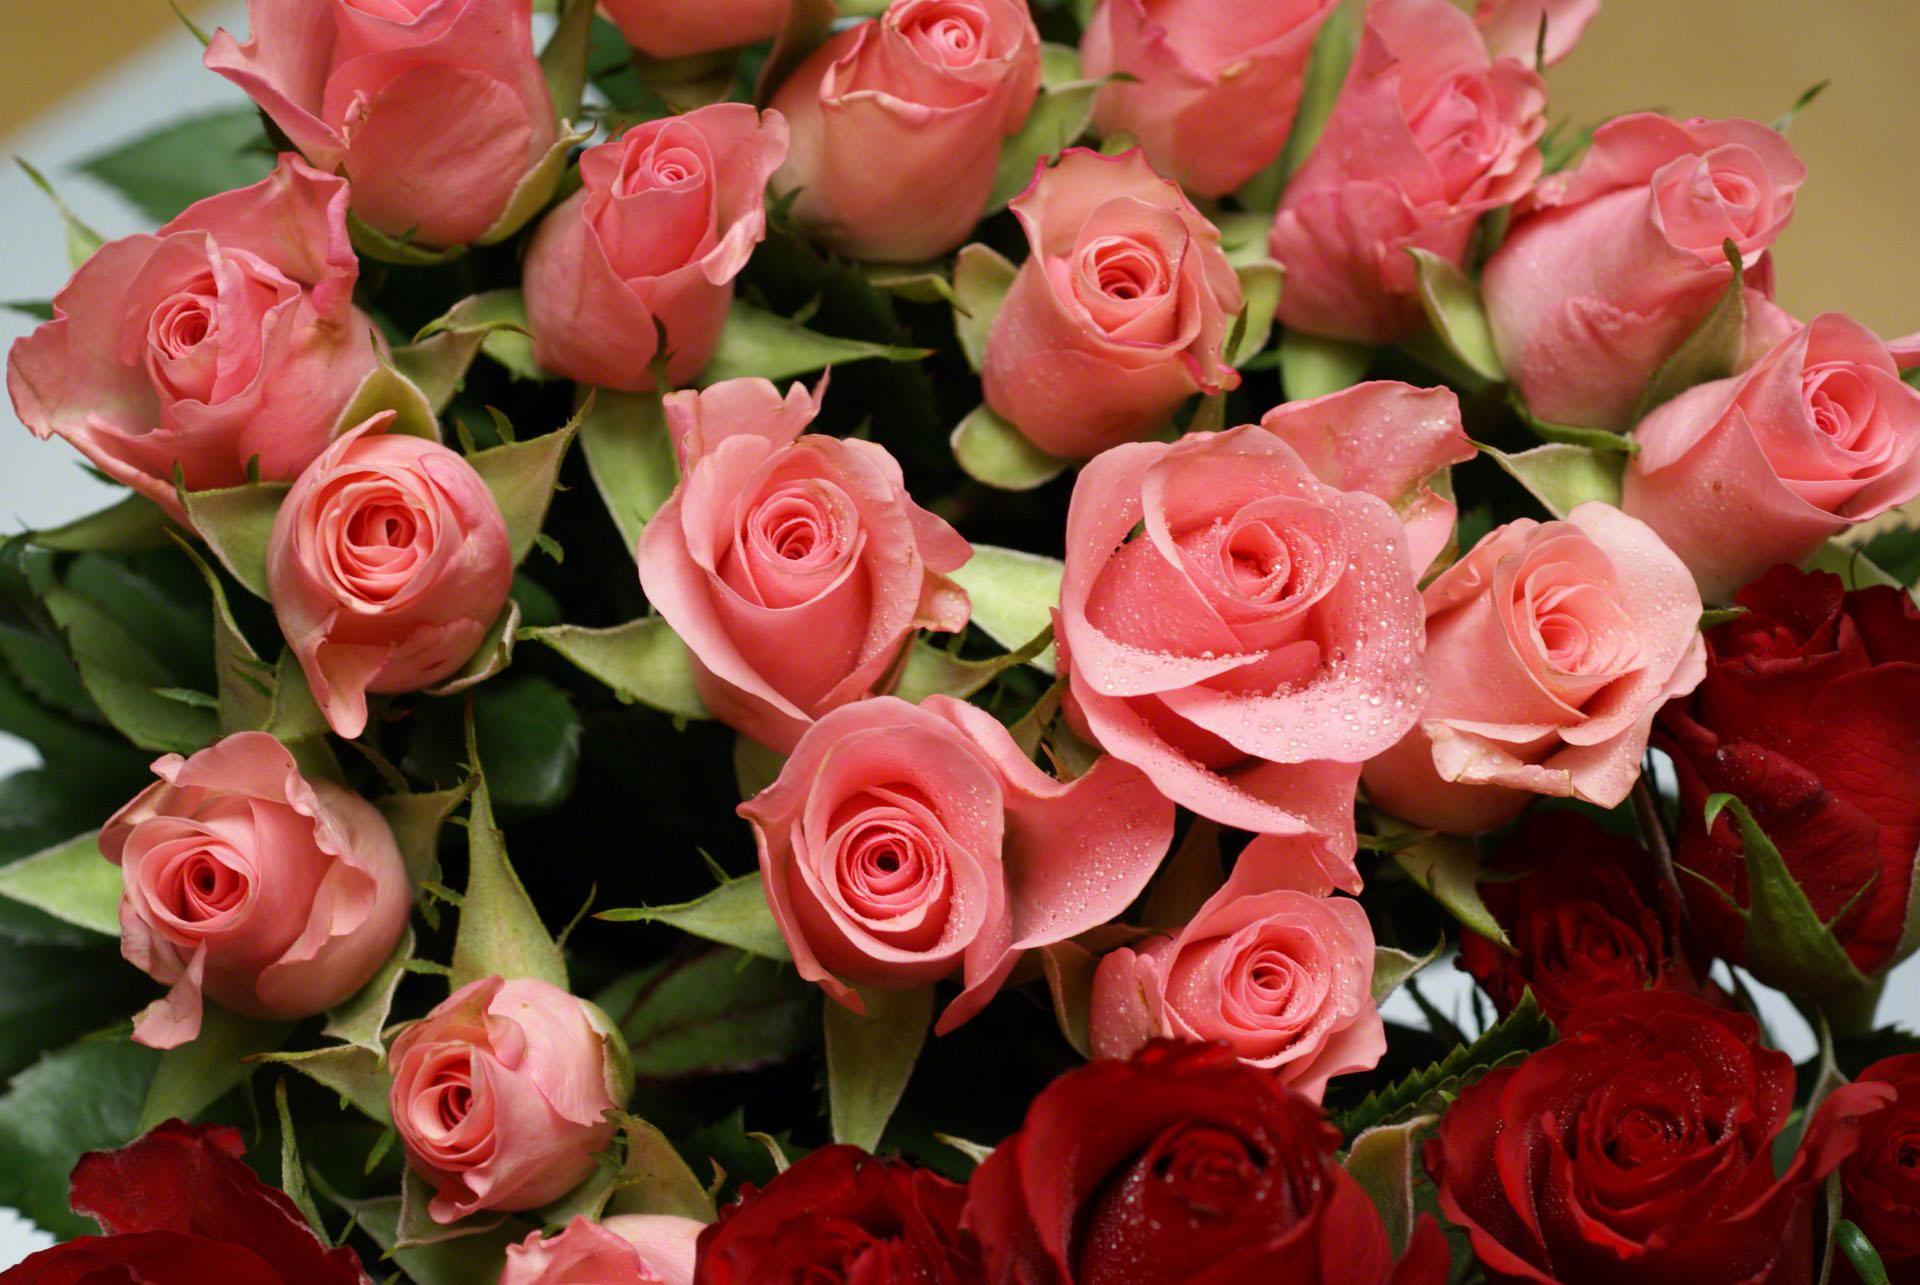 http://www.fabiovisentin.com/photography/photo/12/pink-roses-bouquet-romanticdsc01624.jpg